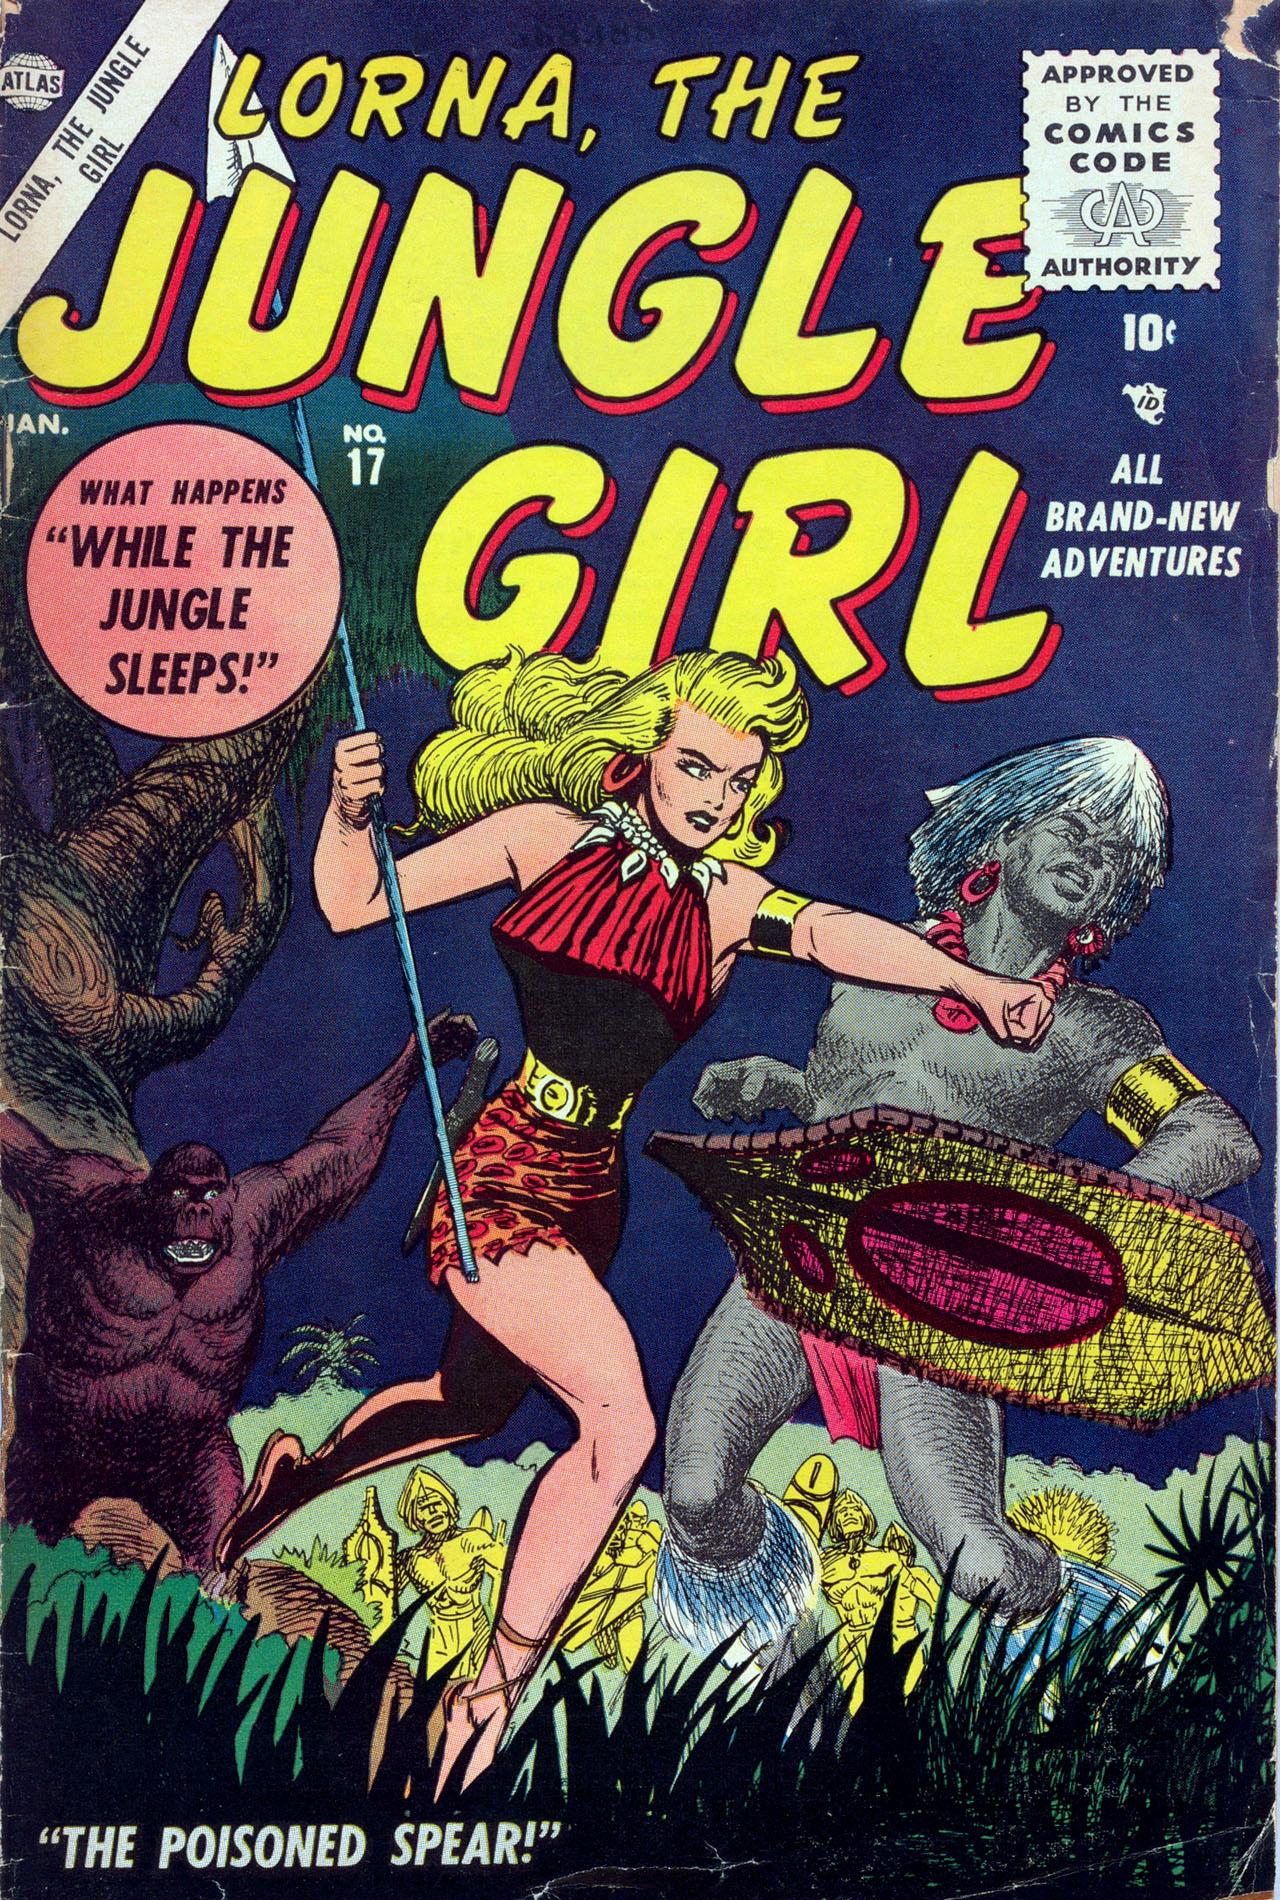 Lorna, The Jungle Girl 17 Page 1